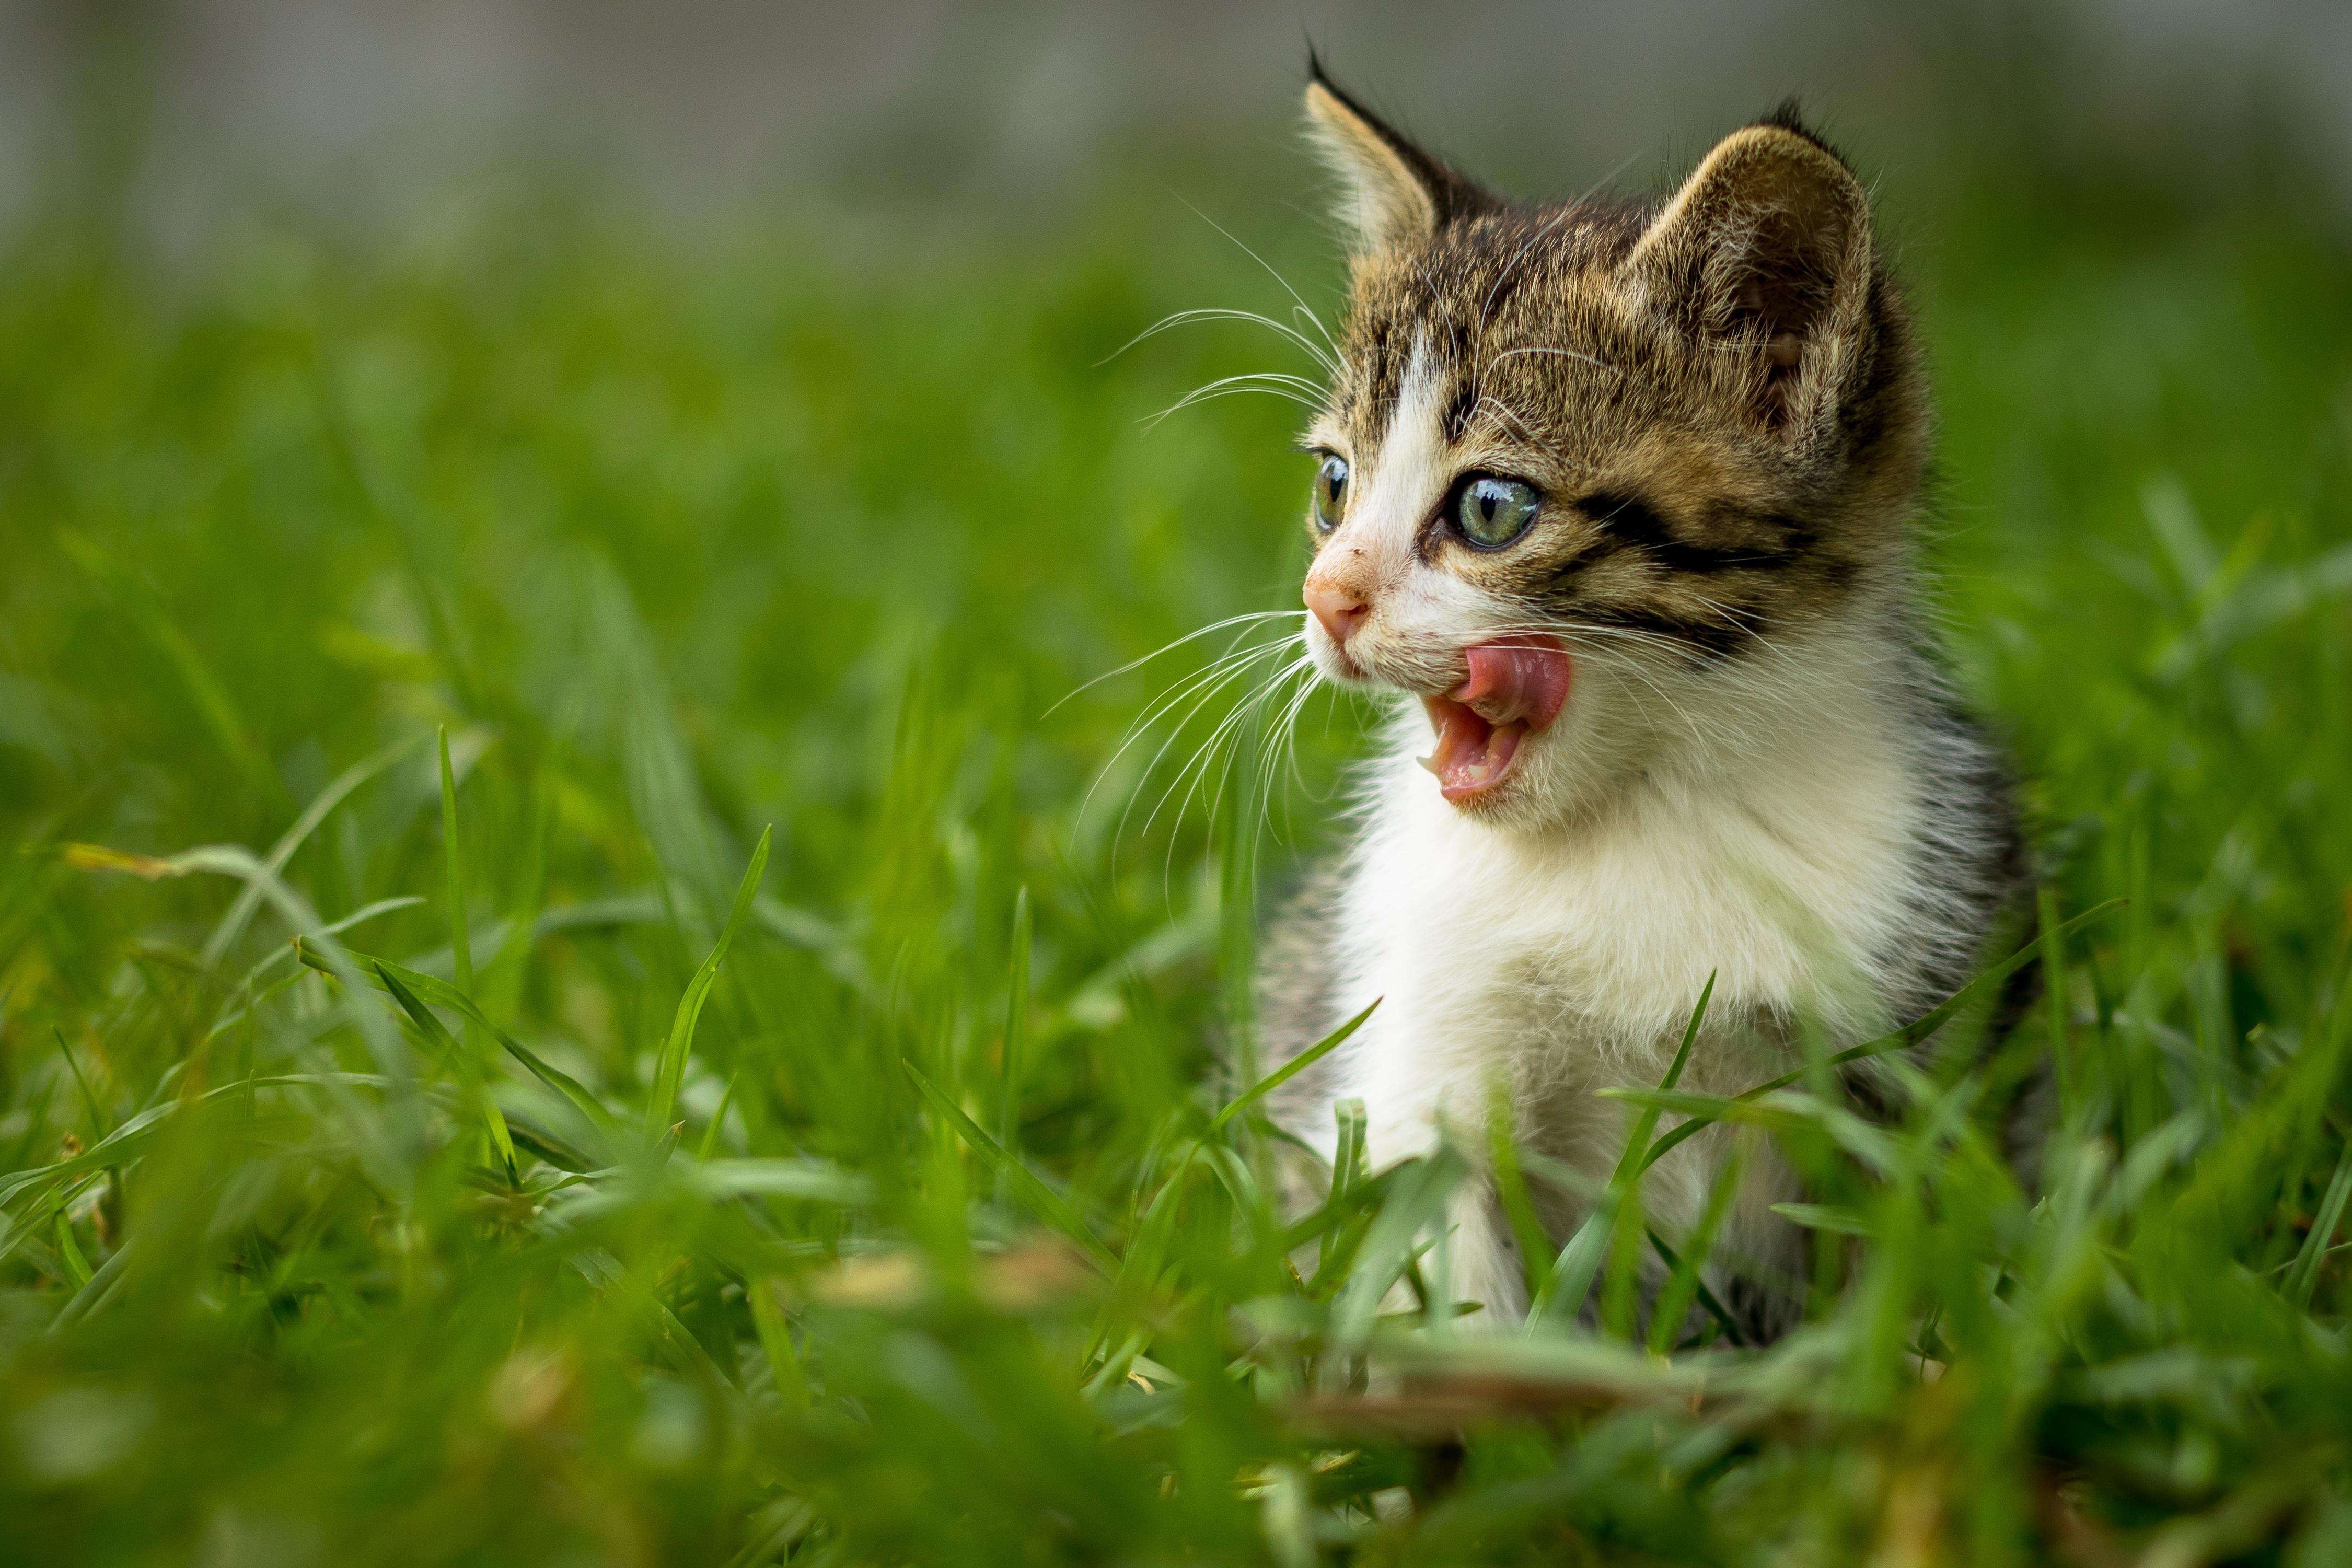 Baby Animal Cat Grass Kitten Pet 4501x3001